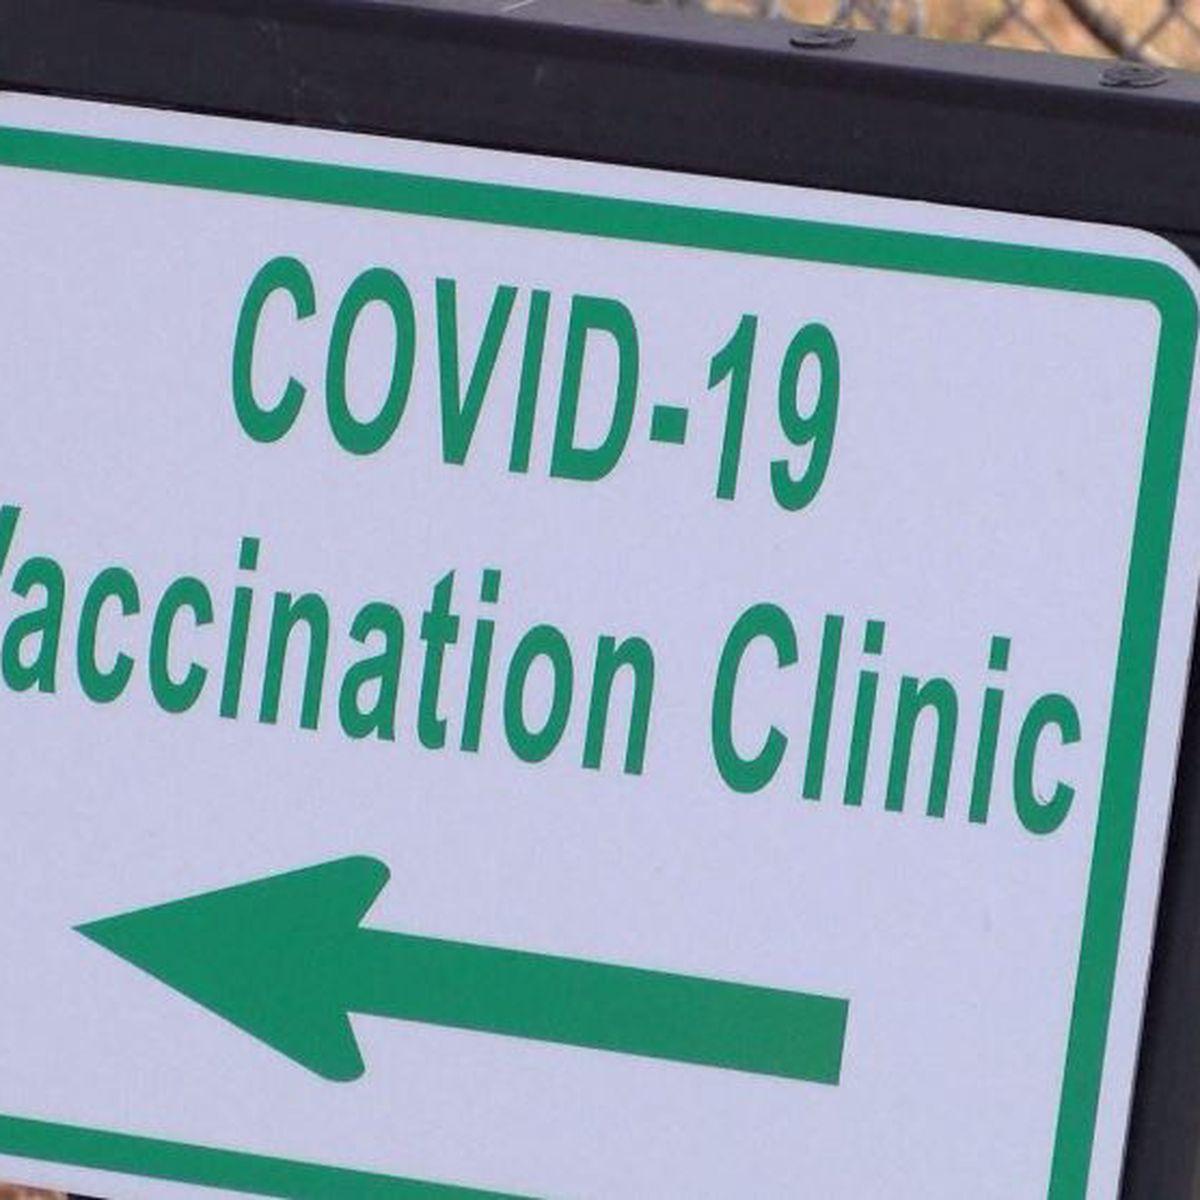 Some vaccine sites operating far below capacity in Alabama